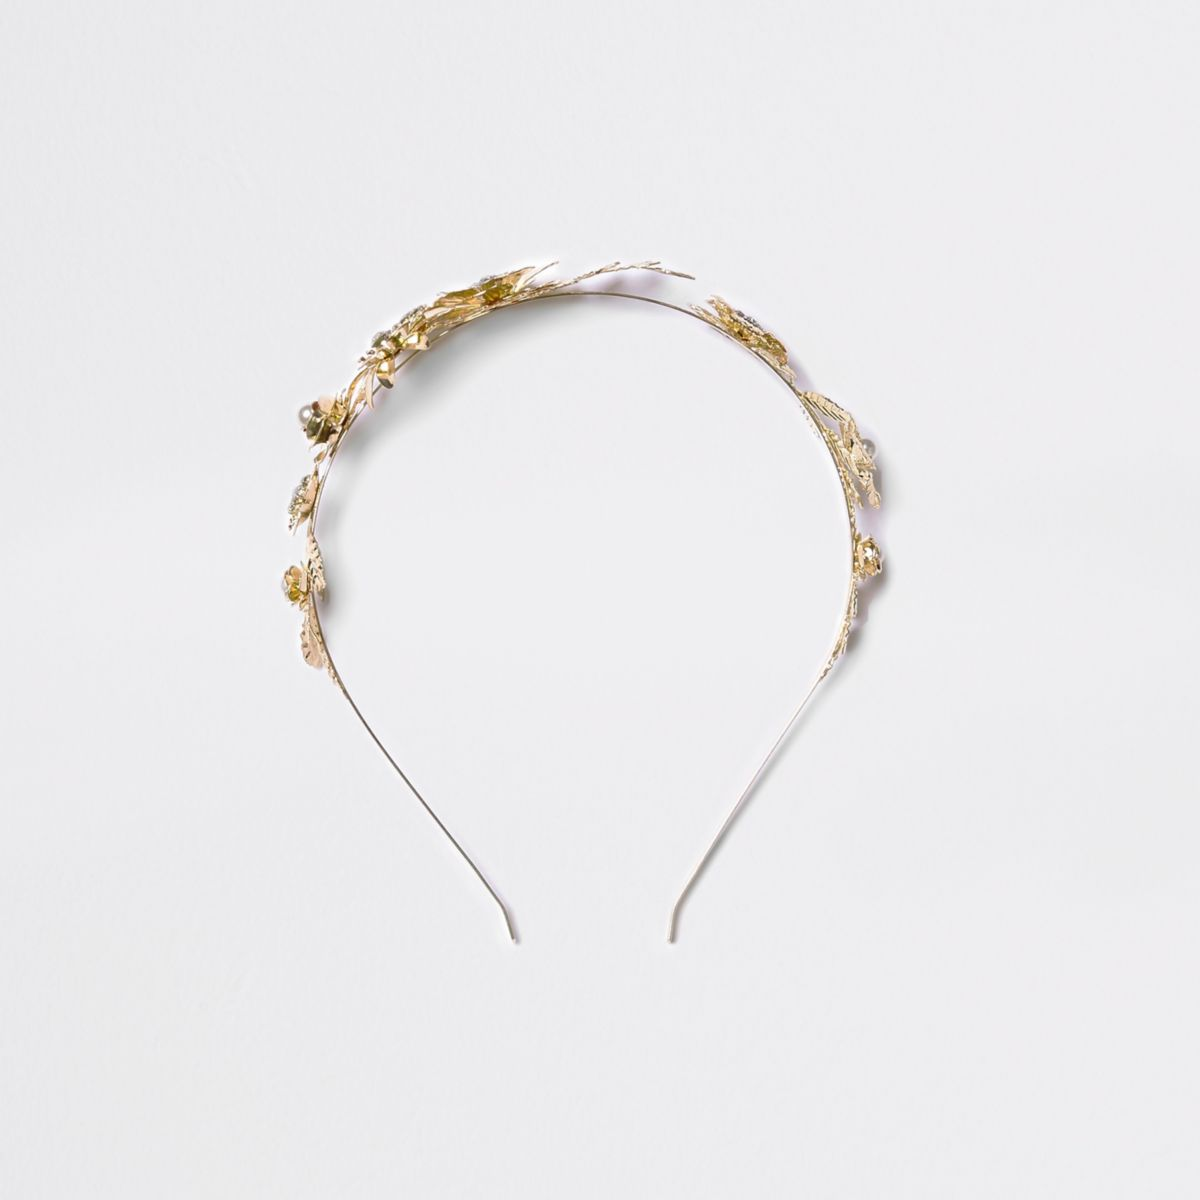 Gold tone rhinestone flower hair band